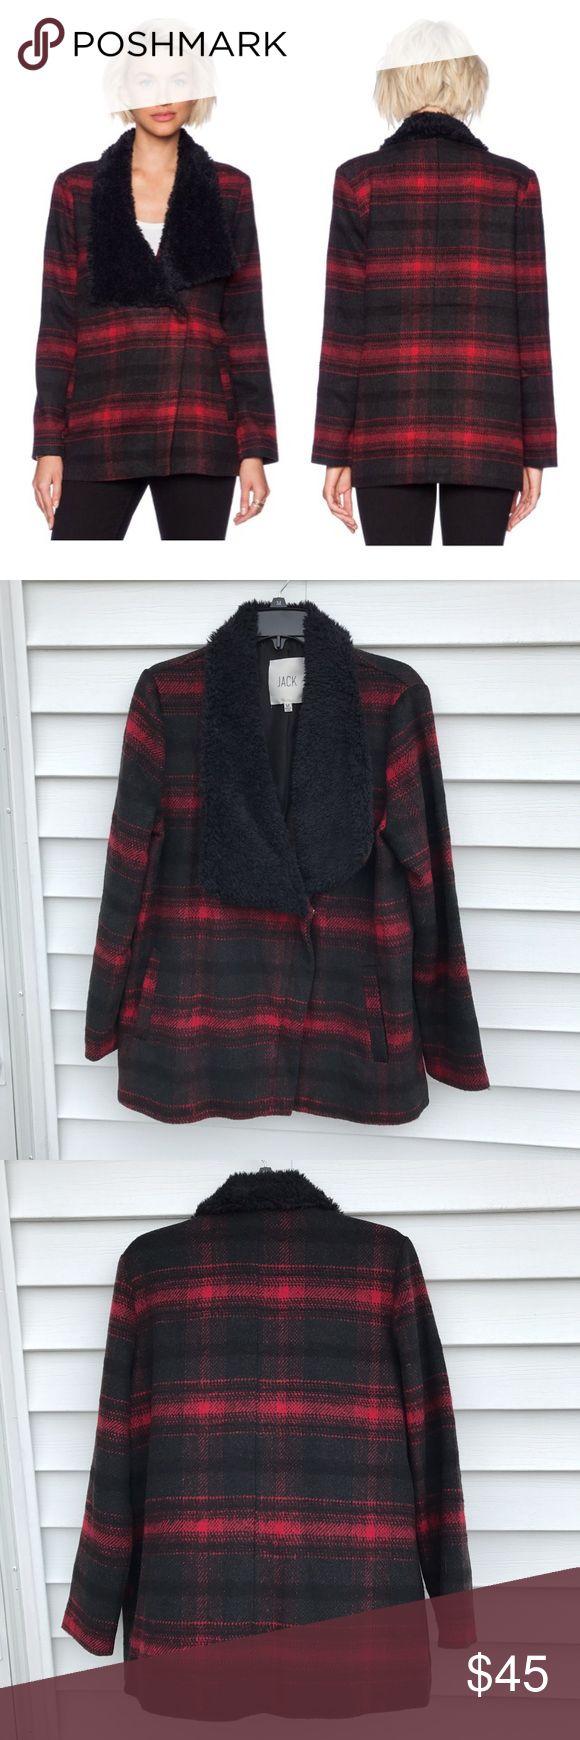 BB Dakota rydell plaid Moto style jacket Never worn• size Medium• NO trades BB Dakota Jackets & Coats